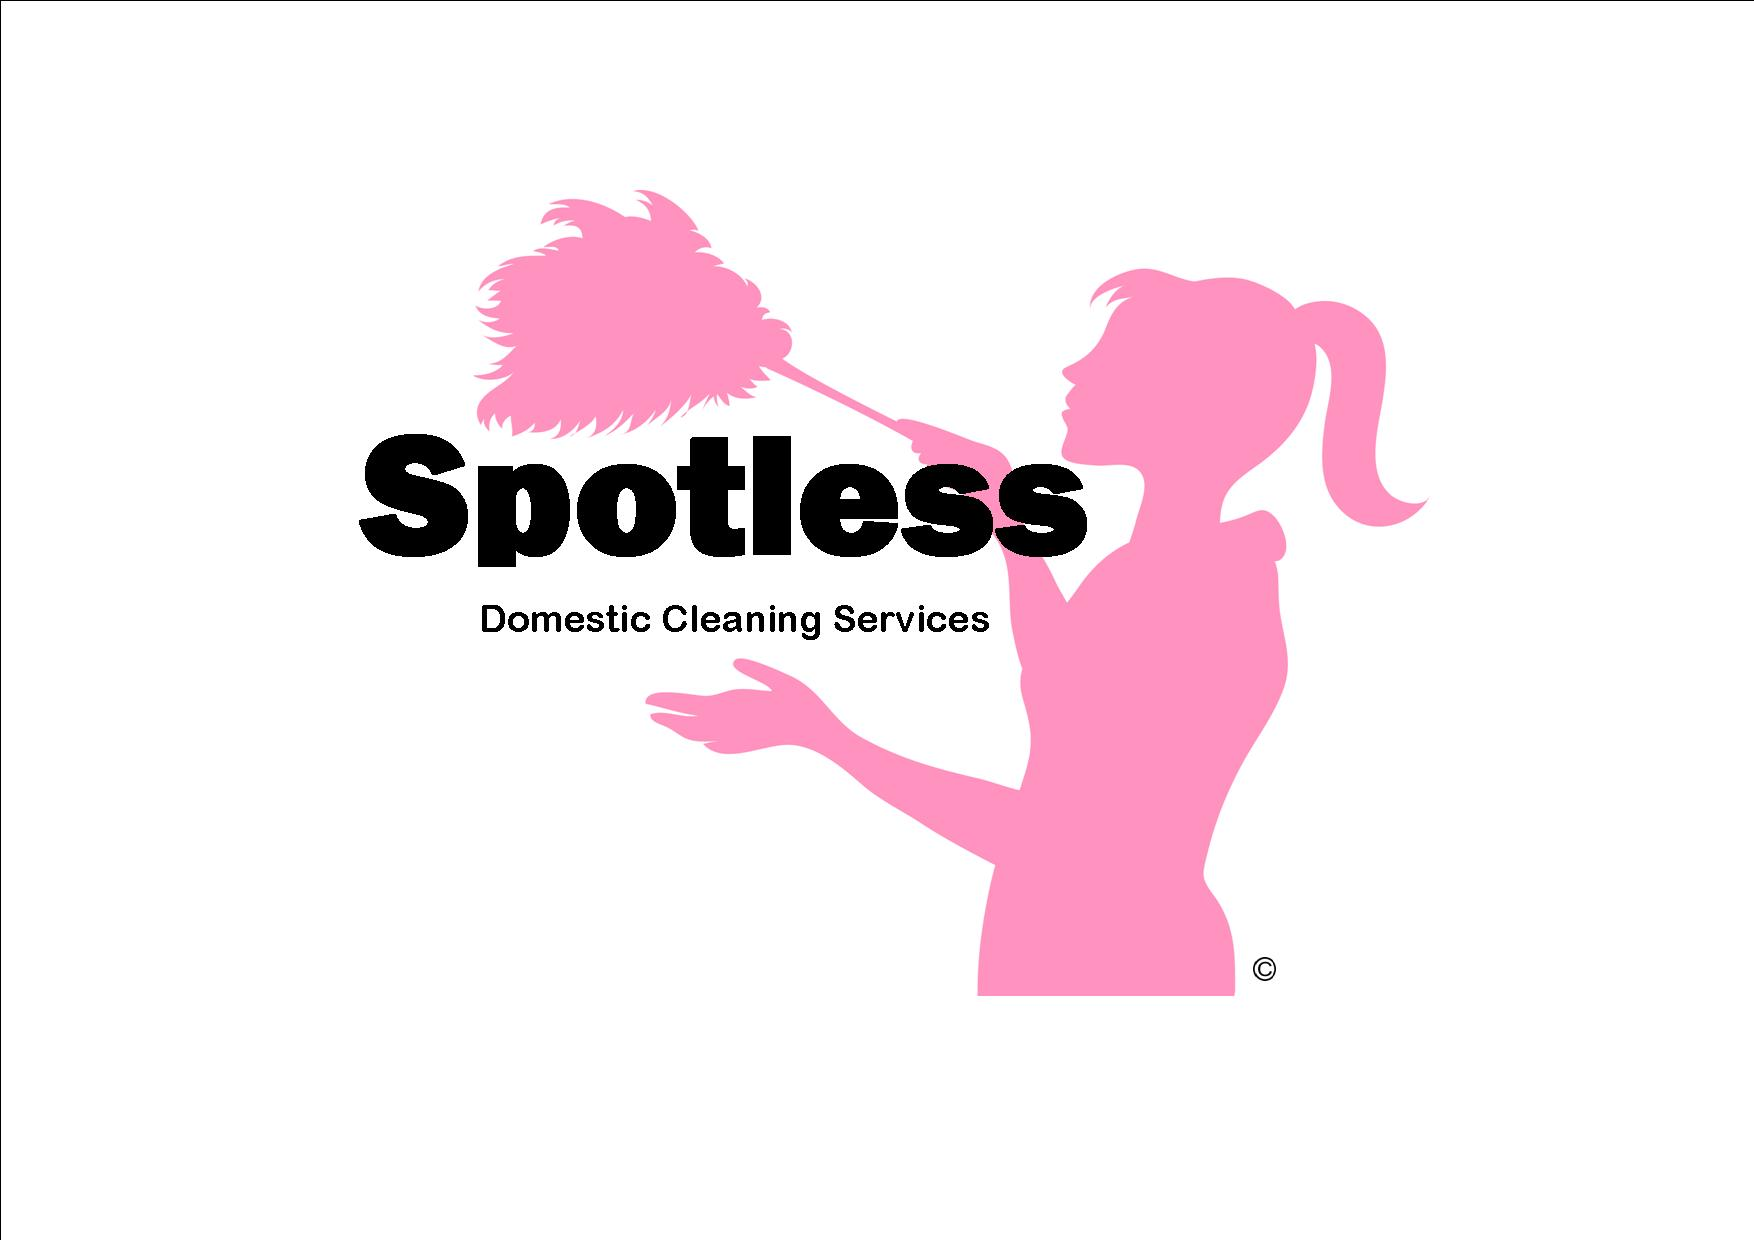 Spotless Logo Wallpaper